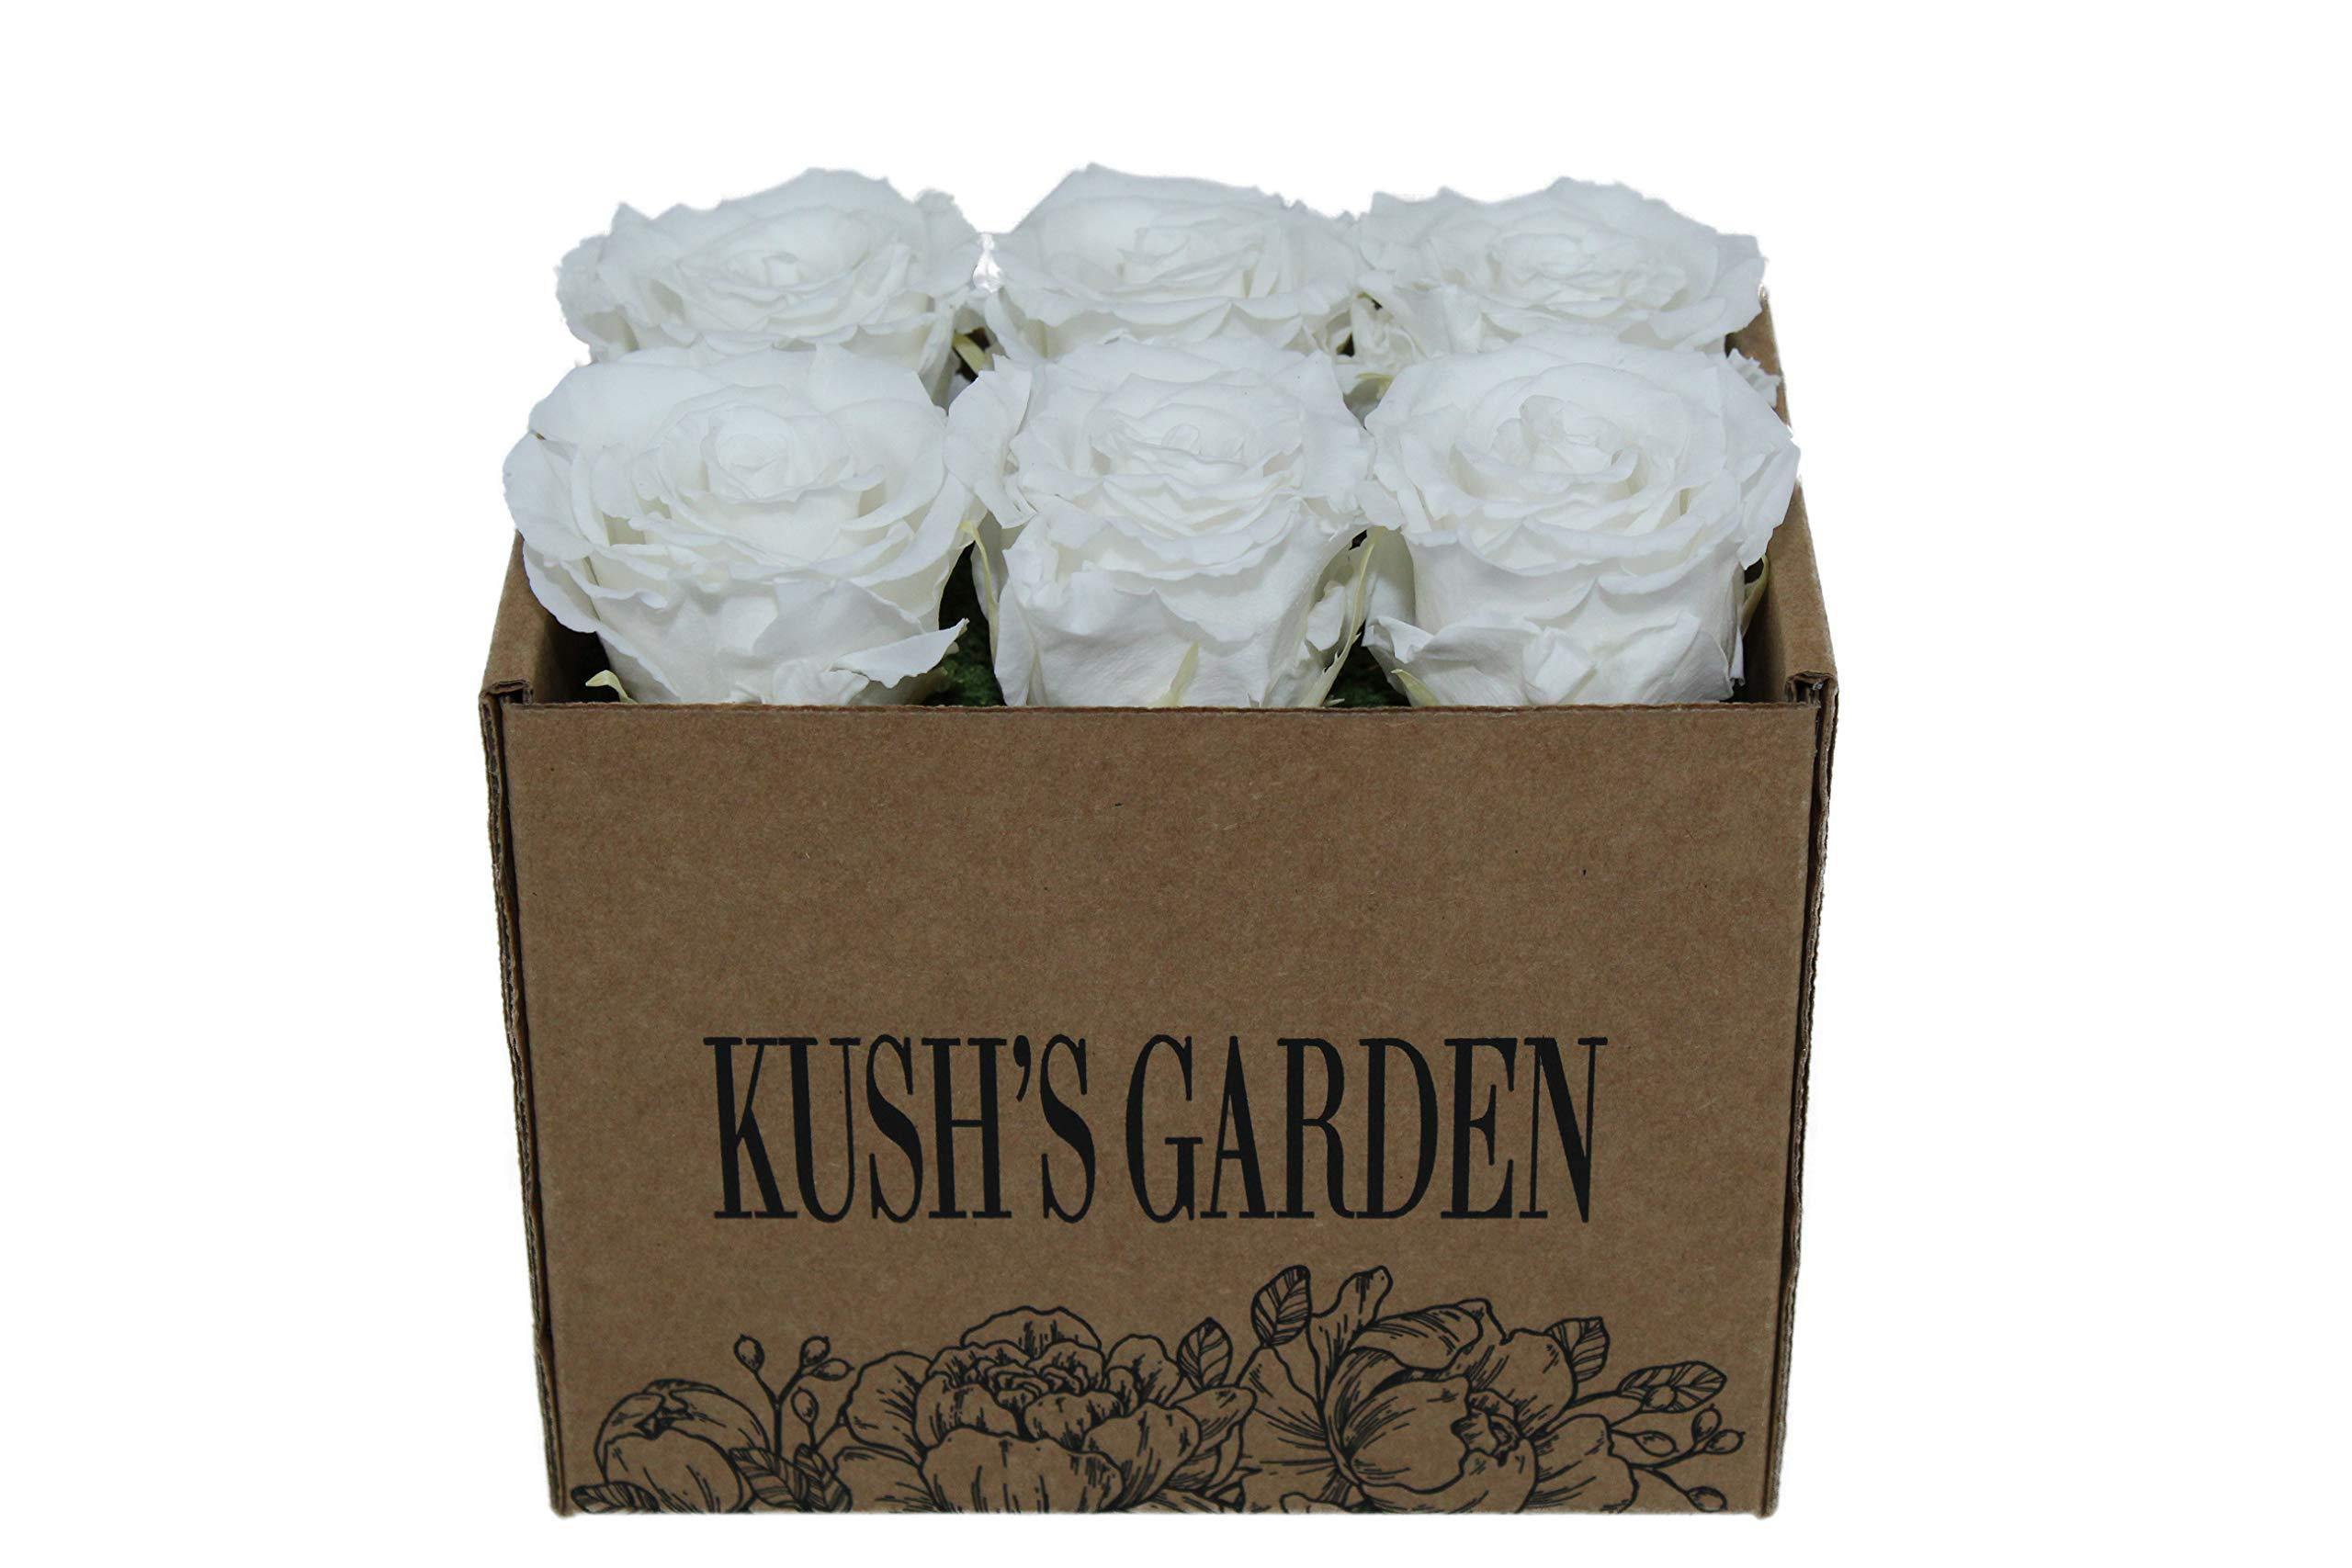 KUSHS GARDEN Real Preserved Roses in Box (Ice King White)